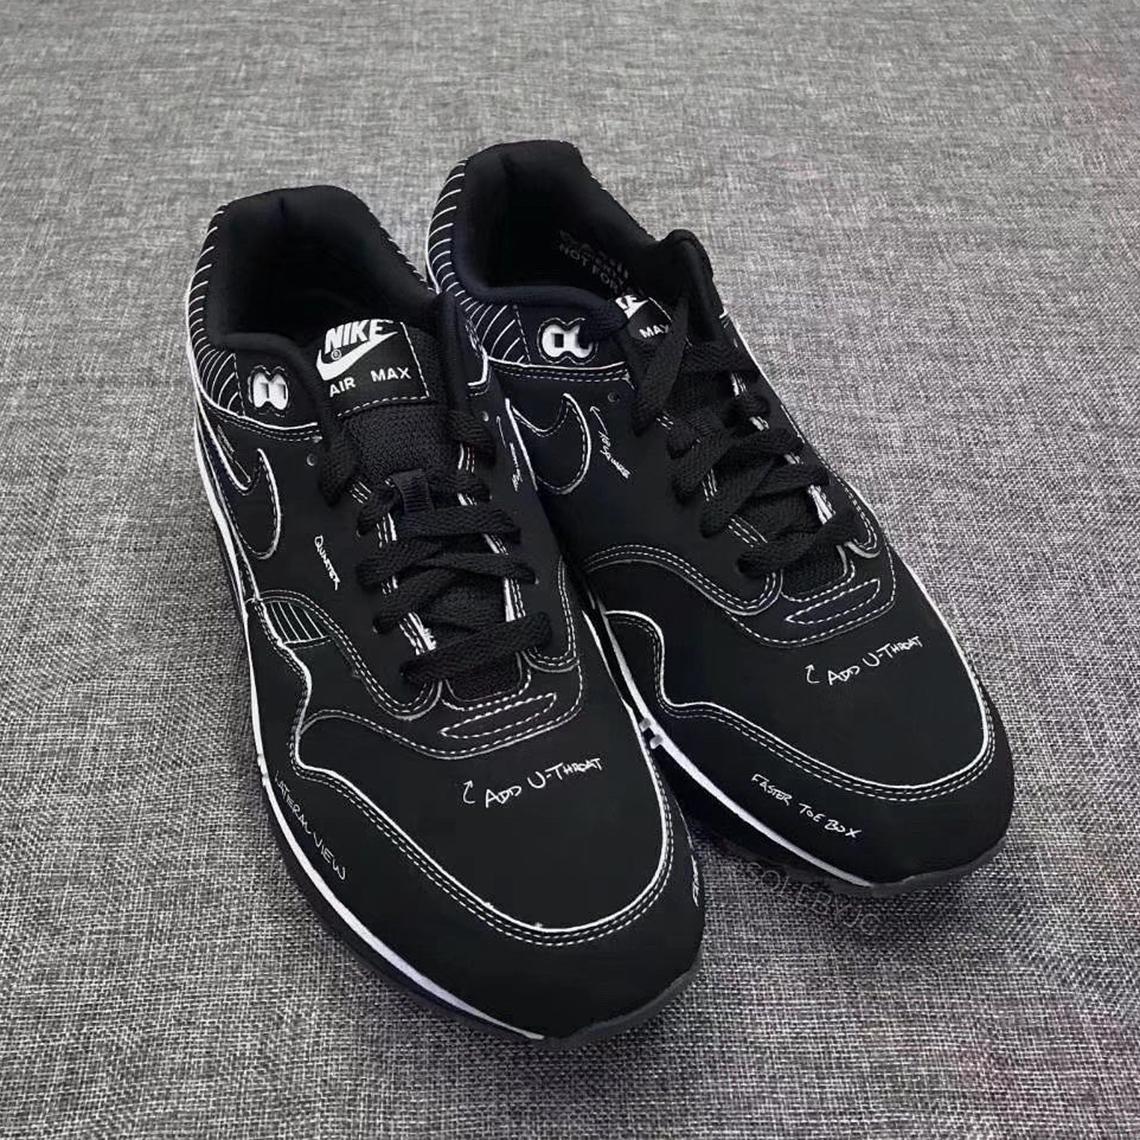 Nike Air Max 1 Tinker Schematic Black CJ4286 001 Release